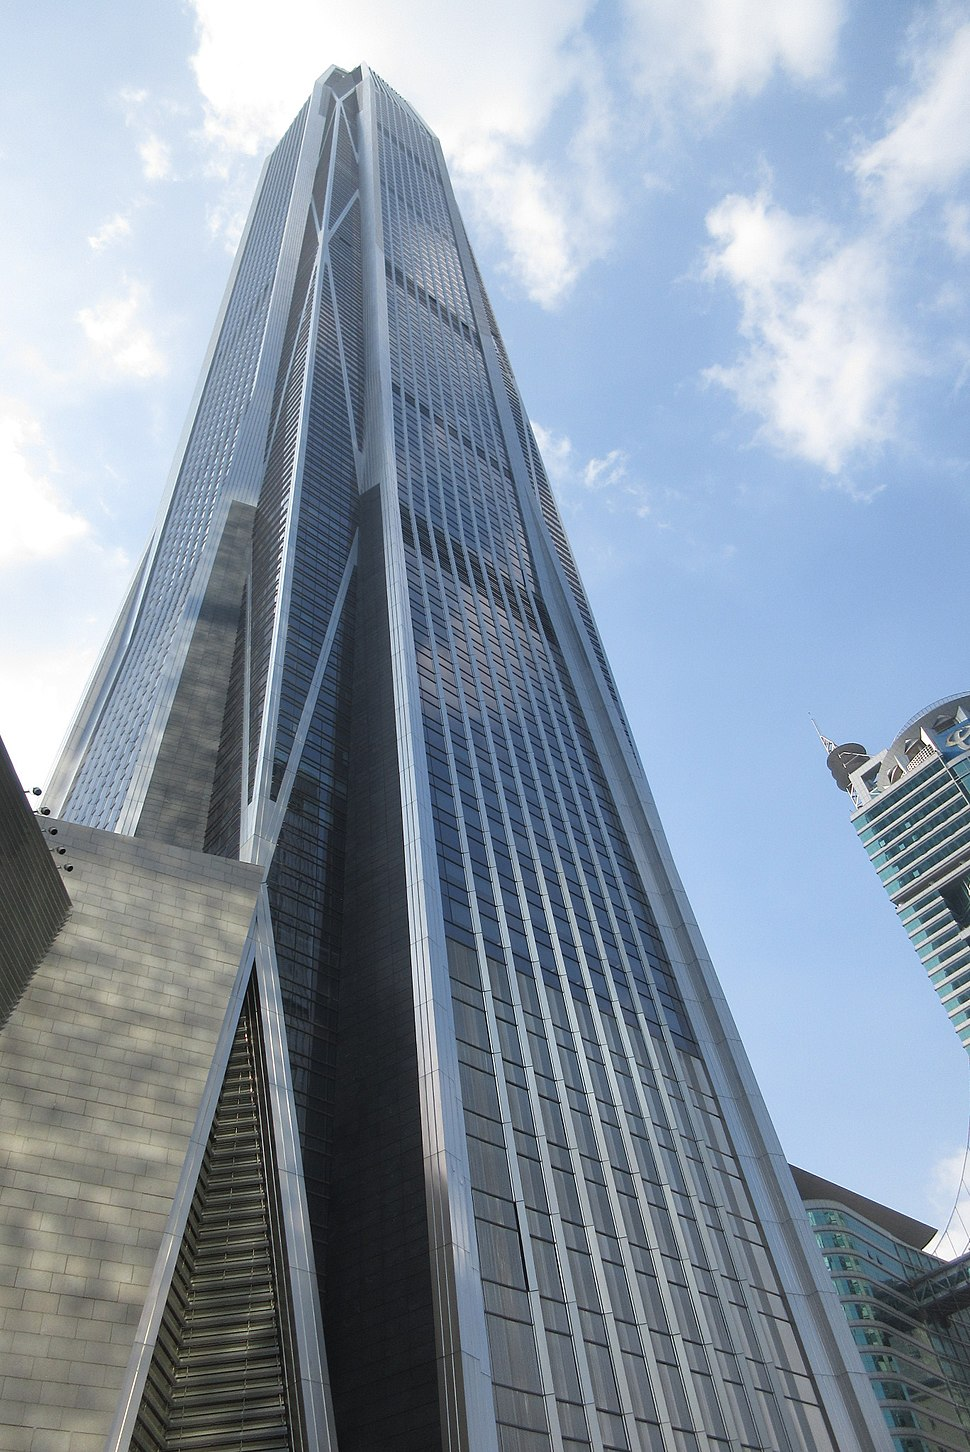 SZ 深圳 Shenzhen 福田 Futian 益田路 Yitian Road 平安國際金融中心 PingAn IFC facade October 2017 IX1 PAPC